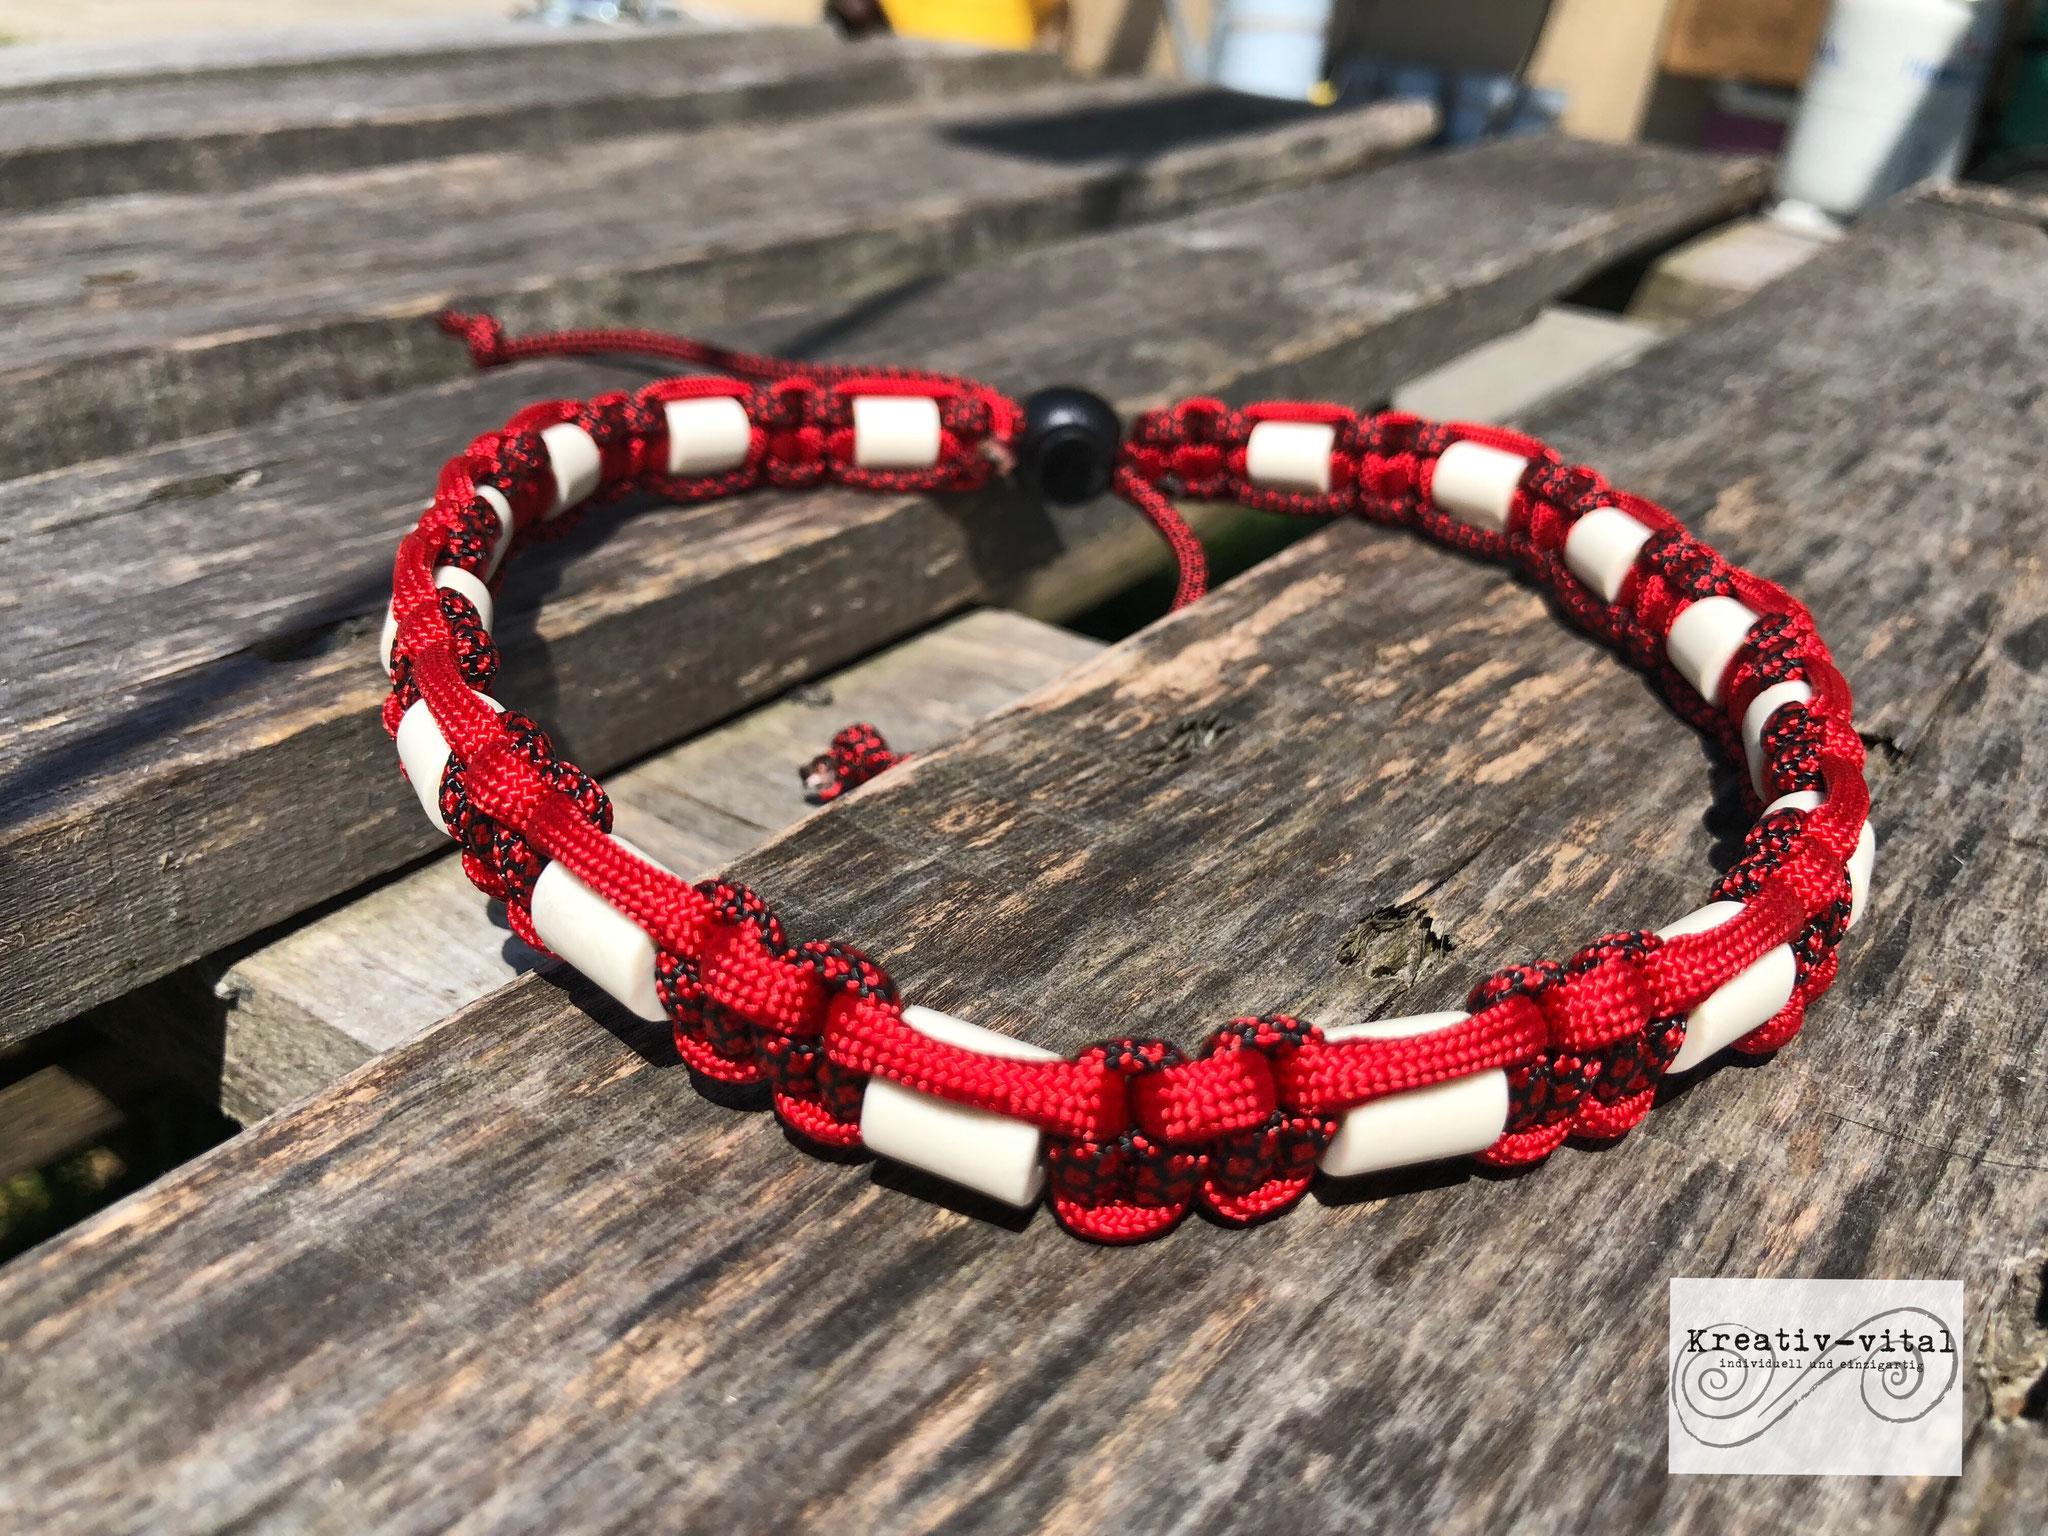 EM Keramik Halsband für Hund/Katze 46-50cm Halsumfang Red/RedBlack